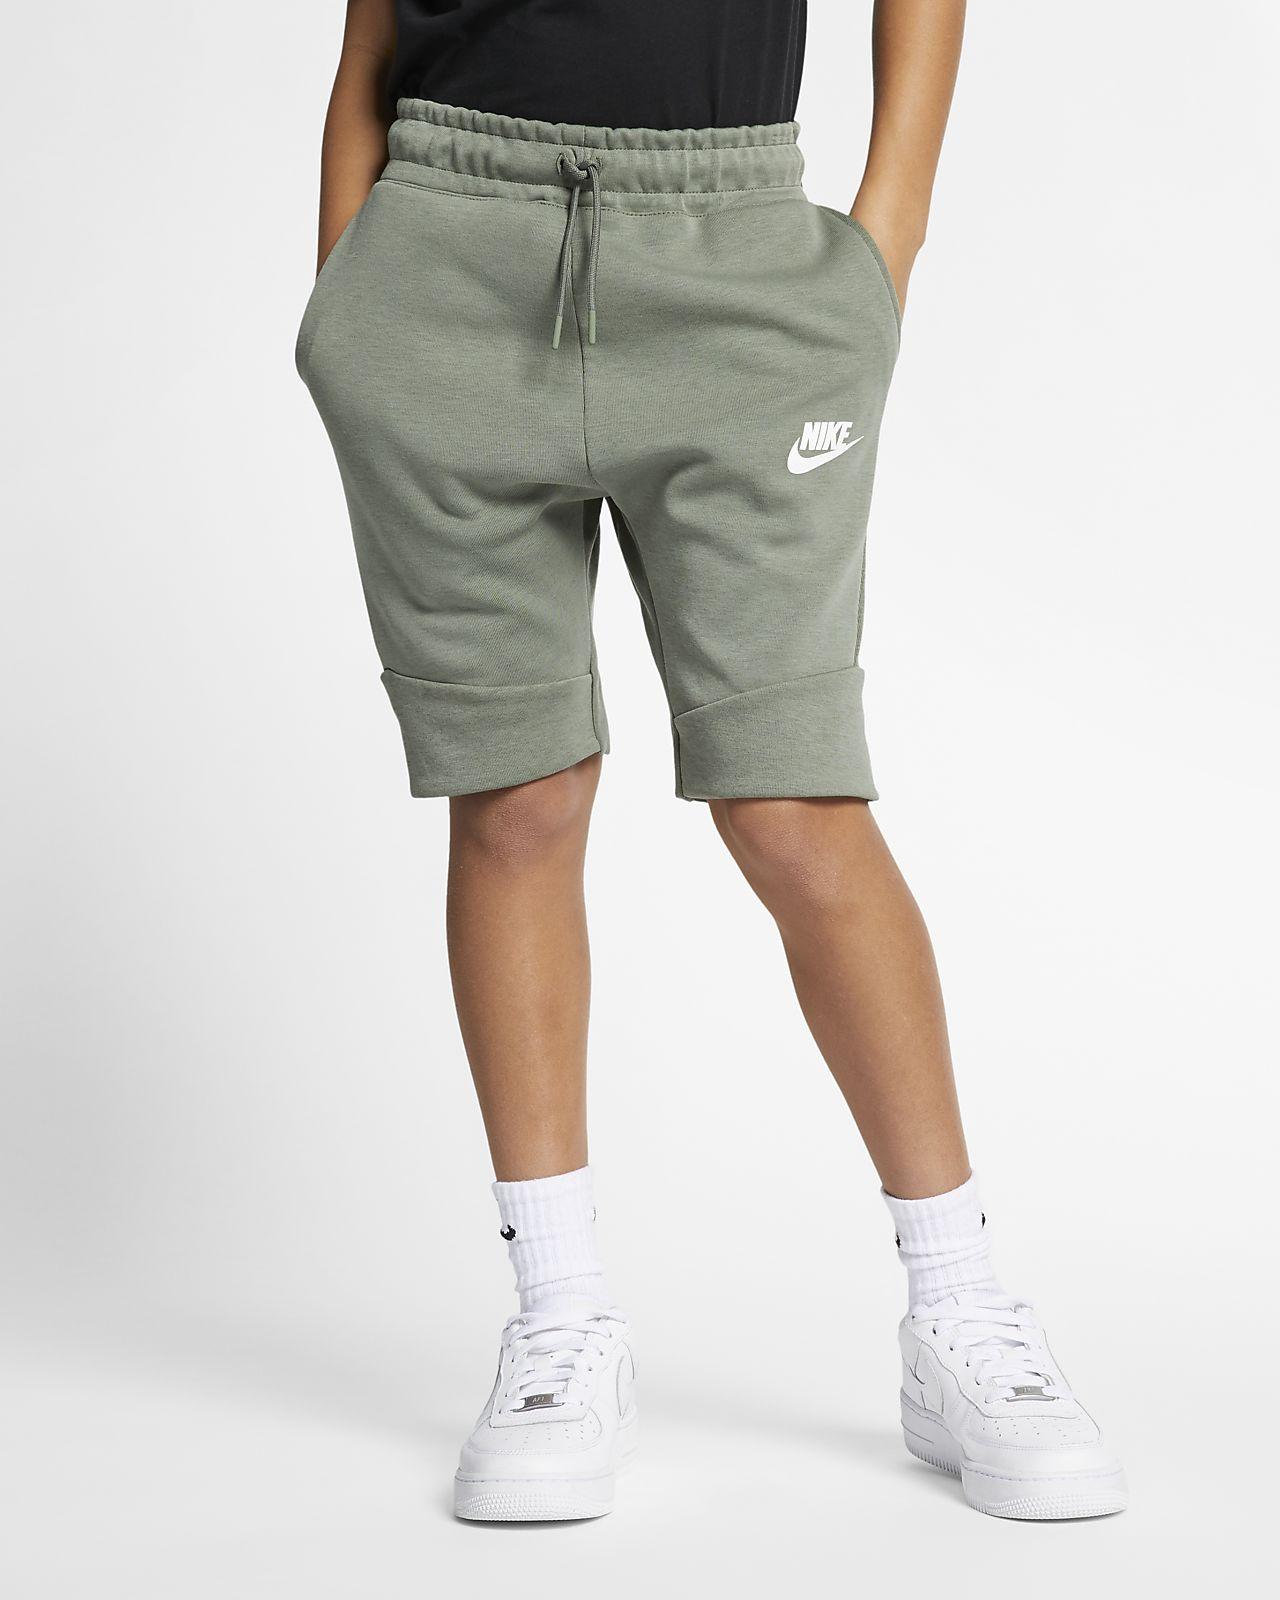 Nike Sportswear Tech Fleece Pantalón corto - Niño/a